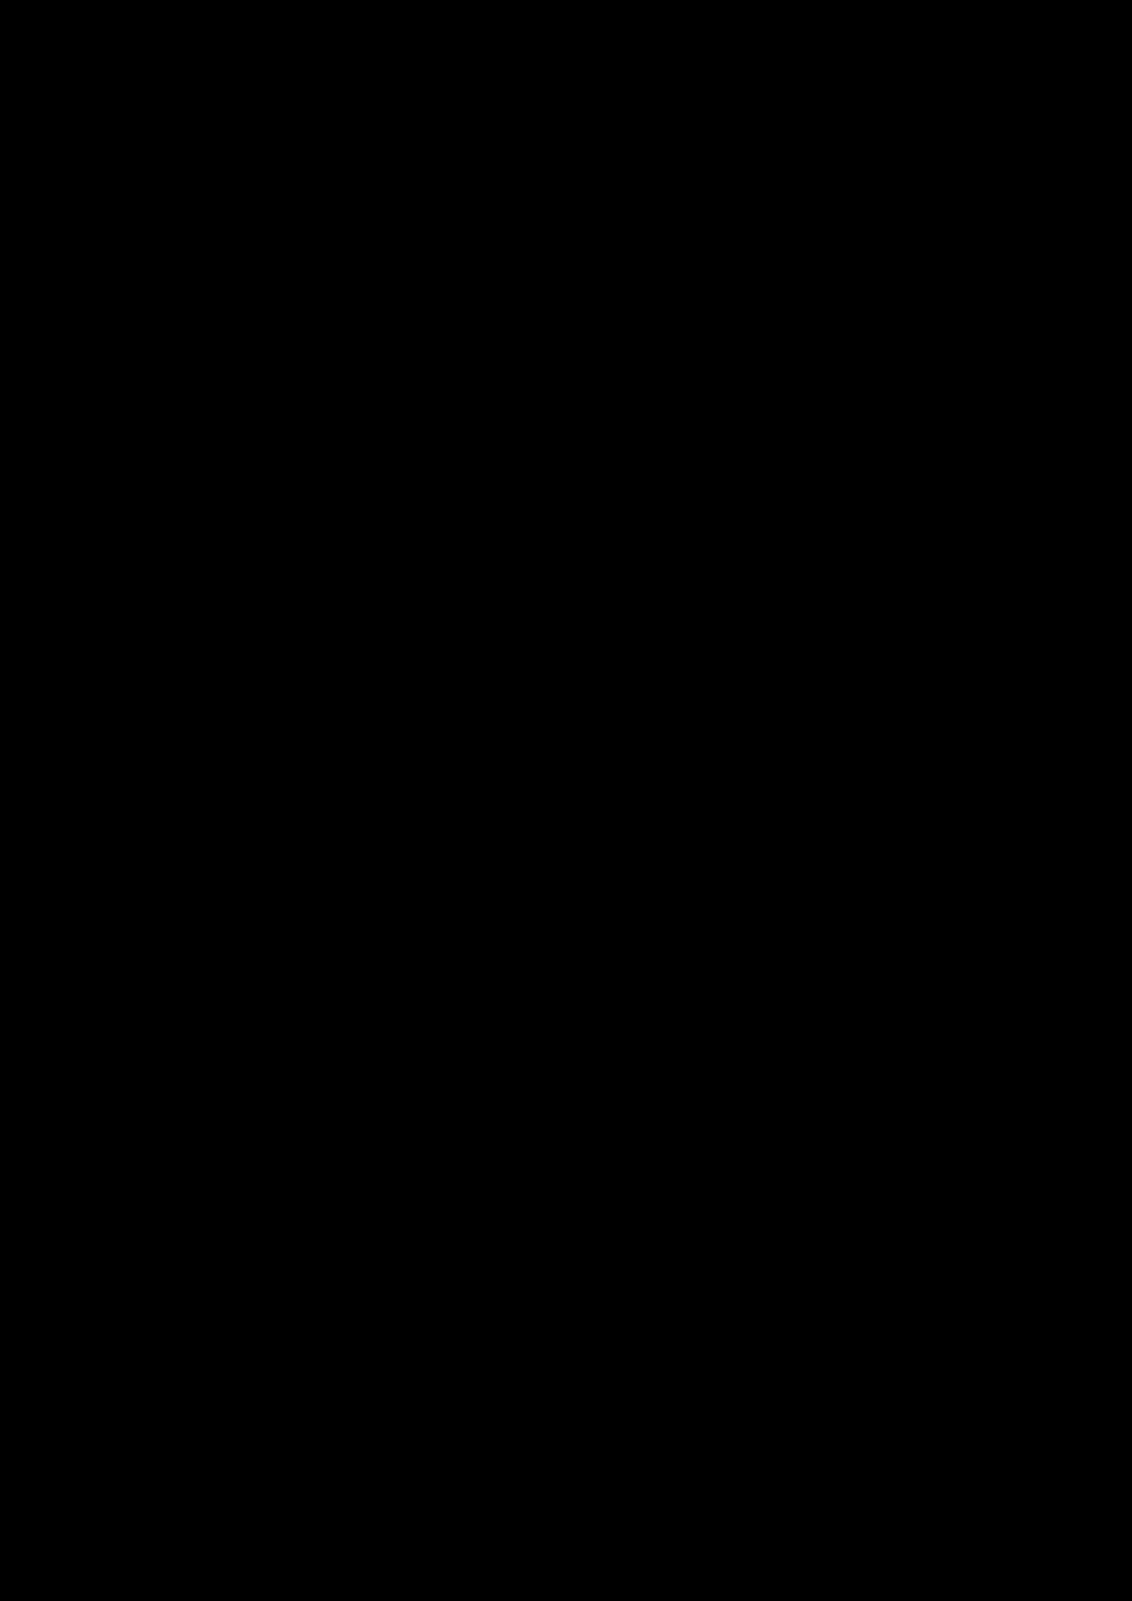 Ten lyubvi slide, Image 38